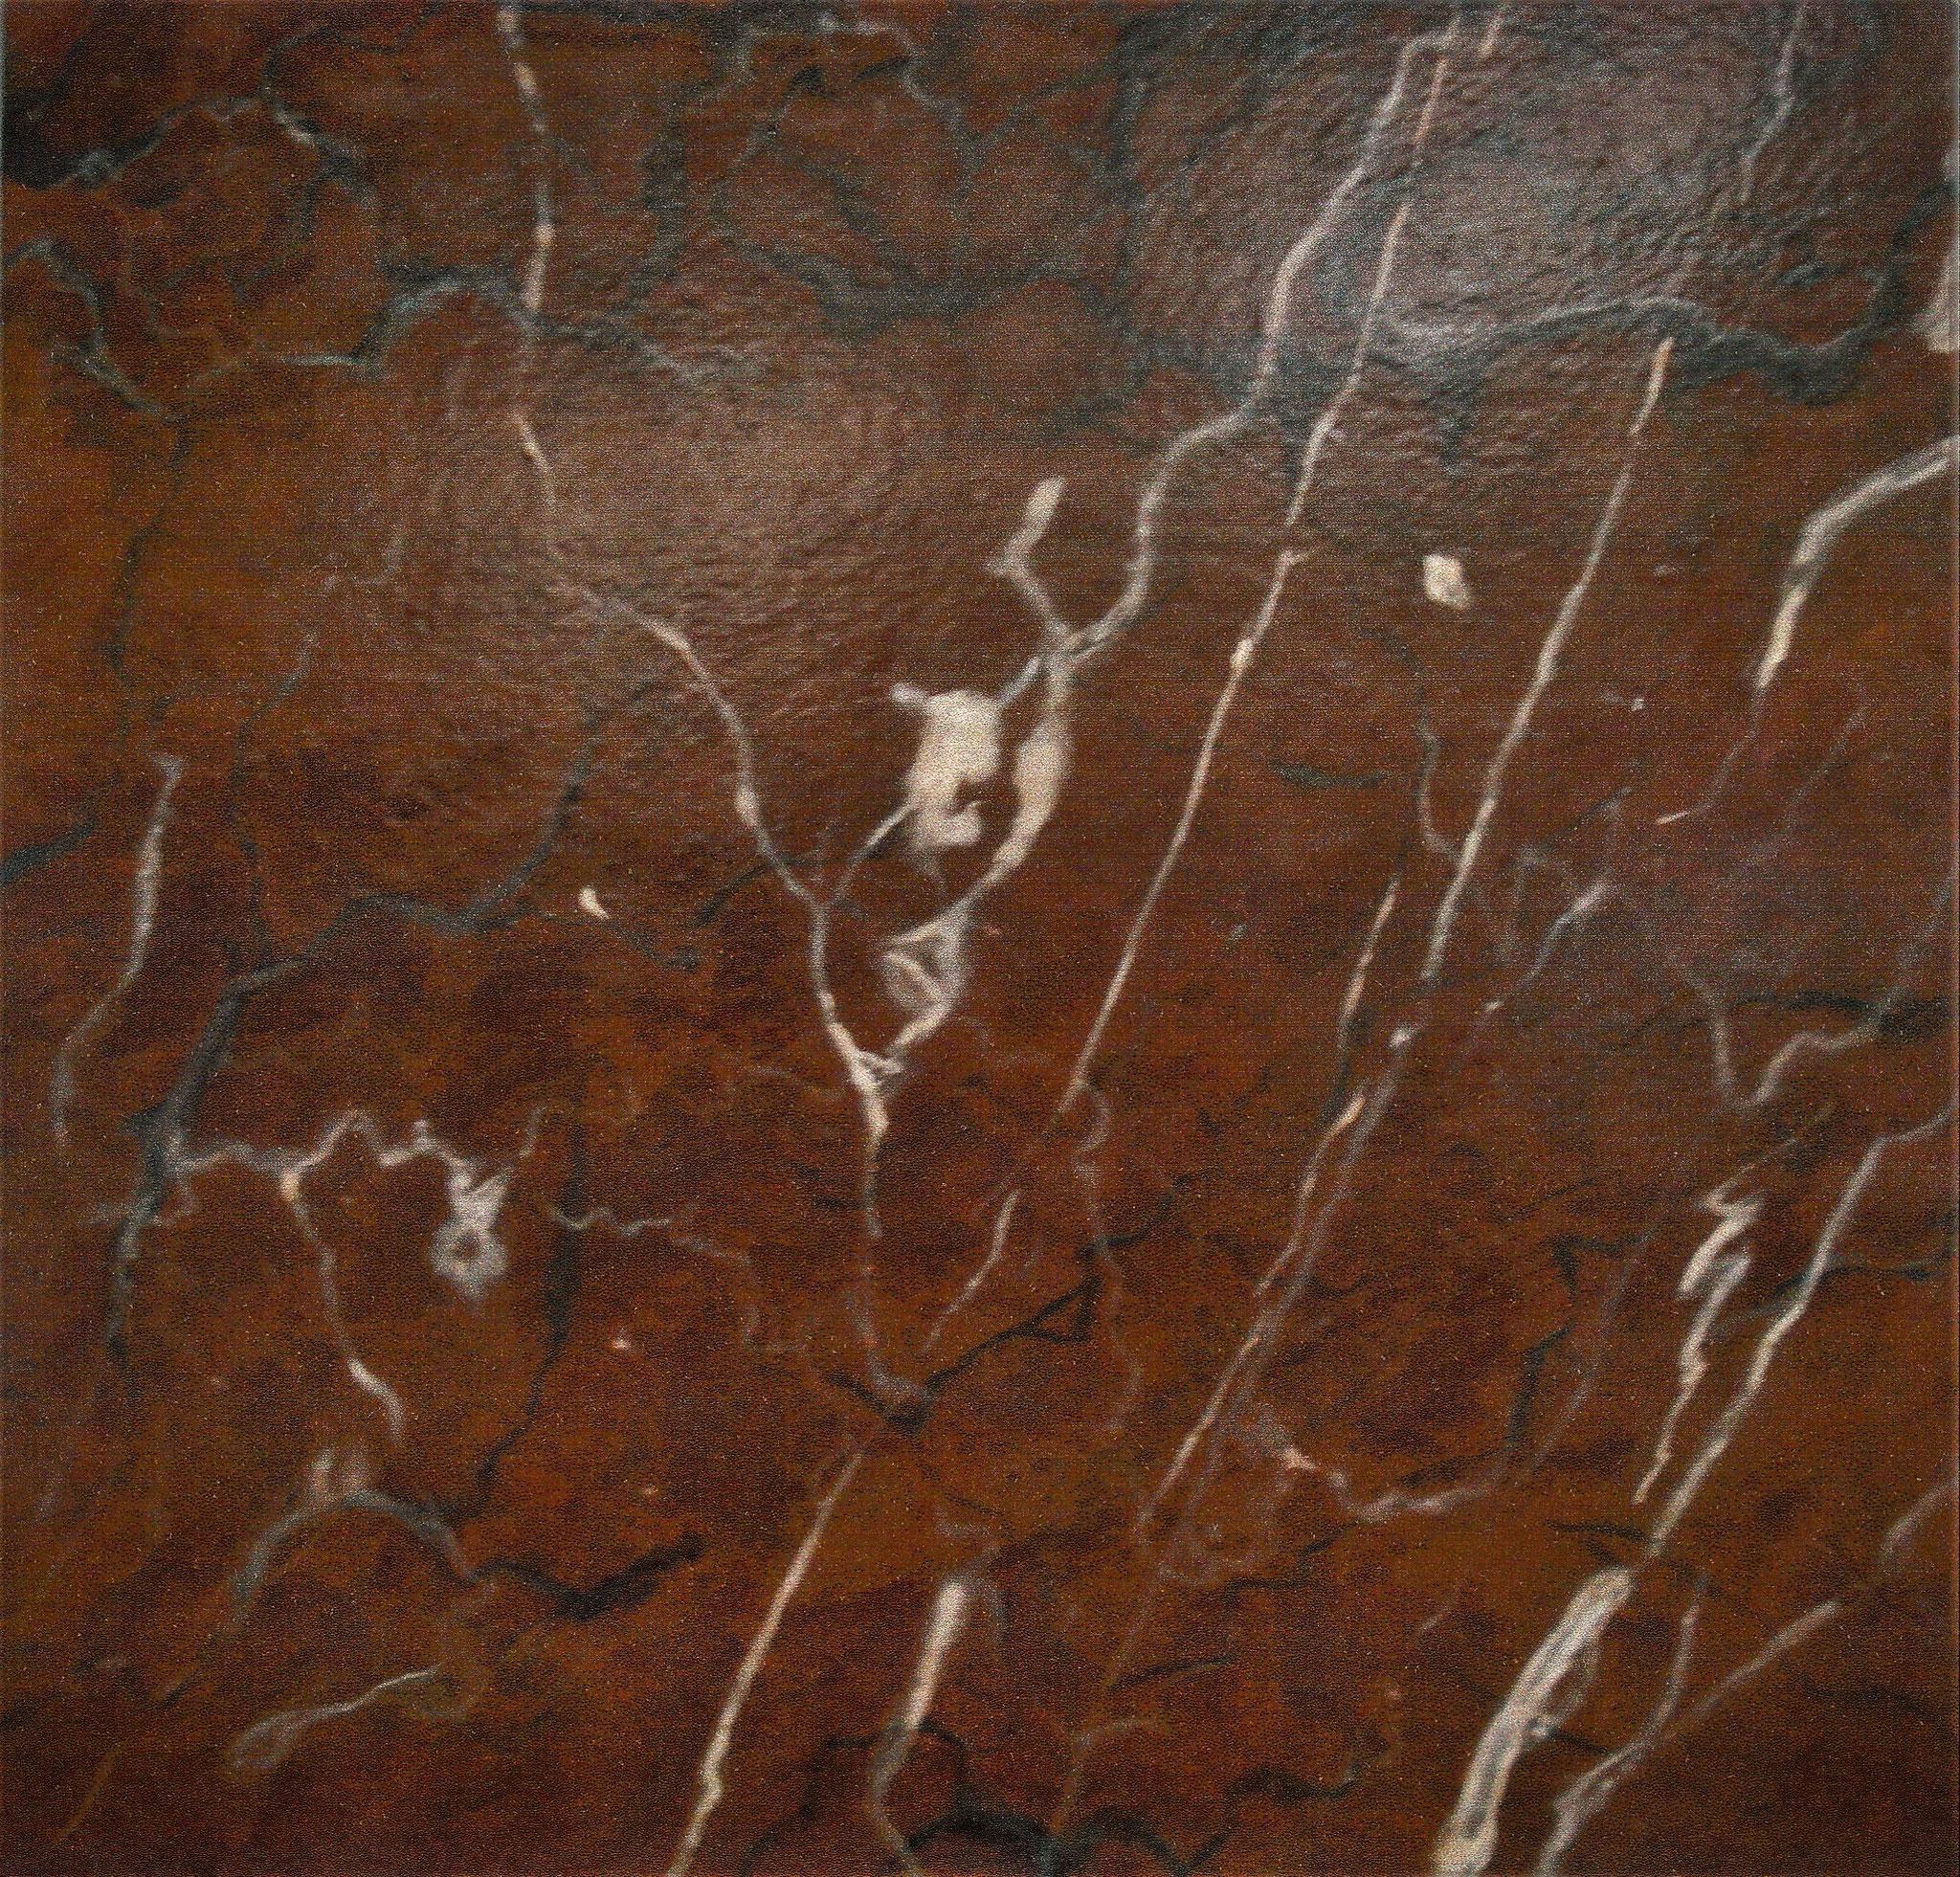 Marmorimitation, Akryl auf Holz, 50 x 50 cm